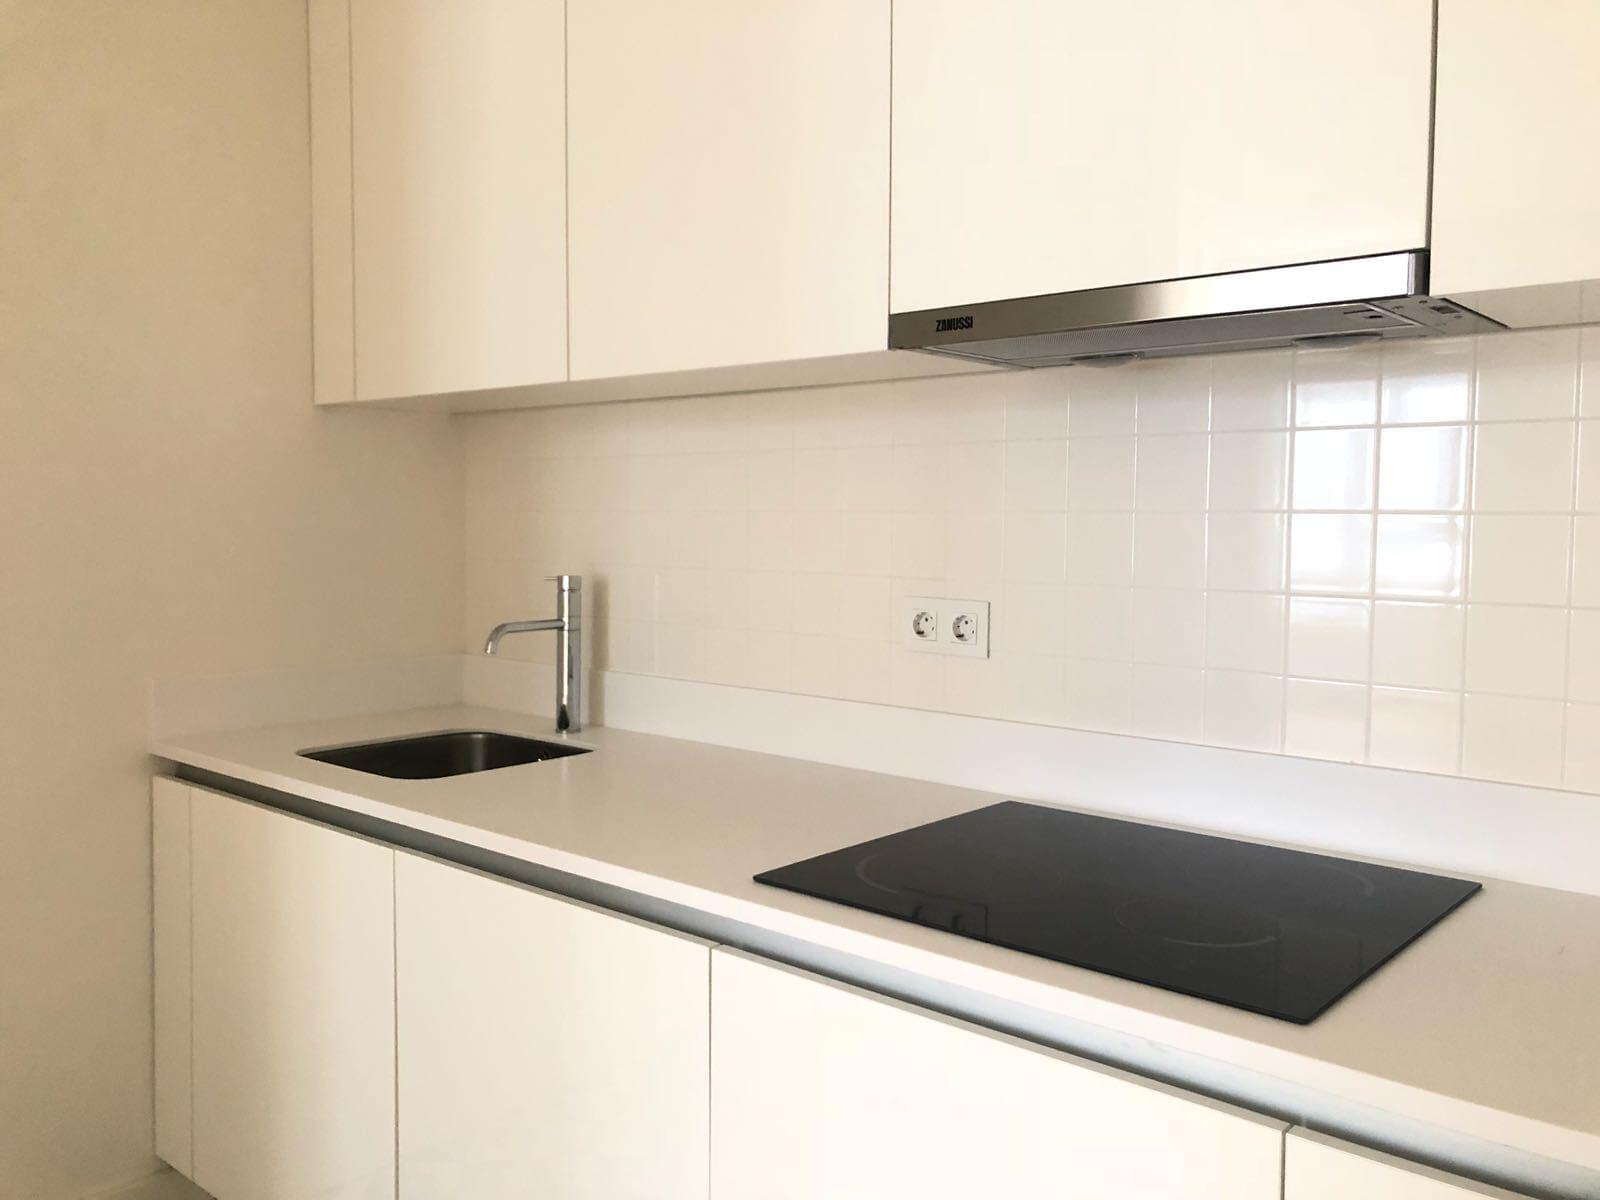 pf17142-apartamento-t2-lisboa-44692404-1b95-44f3-88cc-a35956dcd6c9